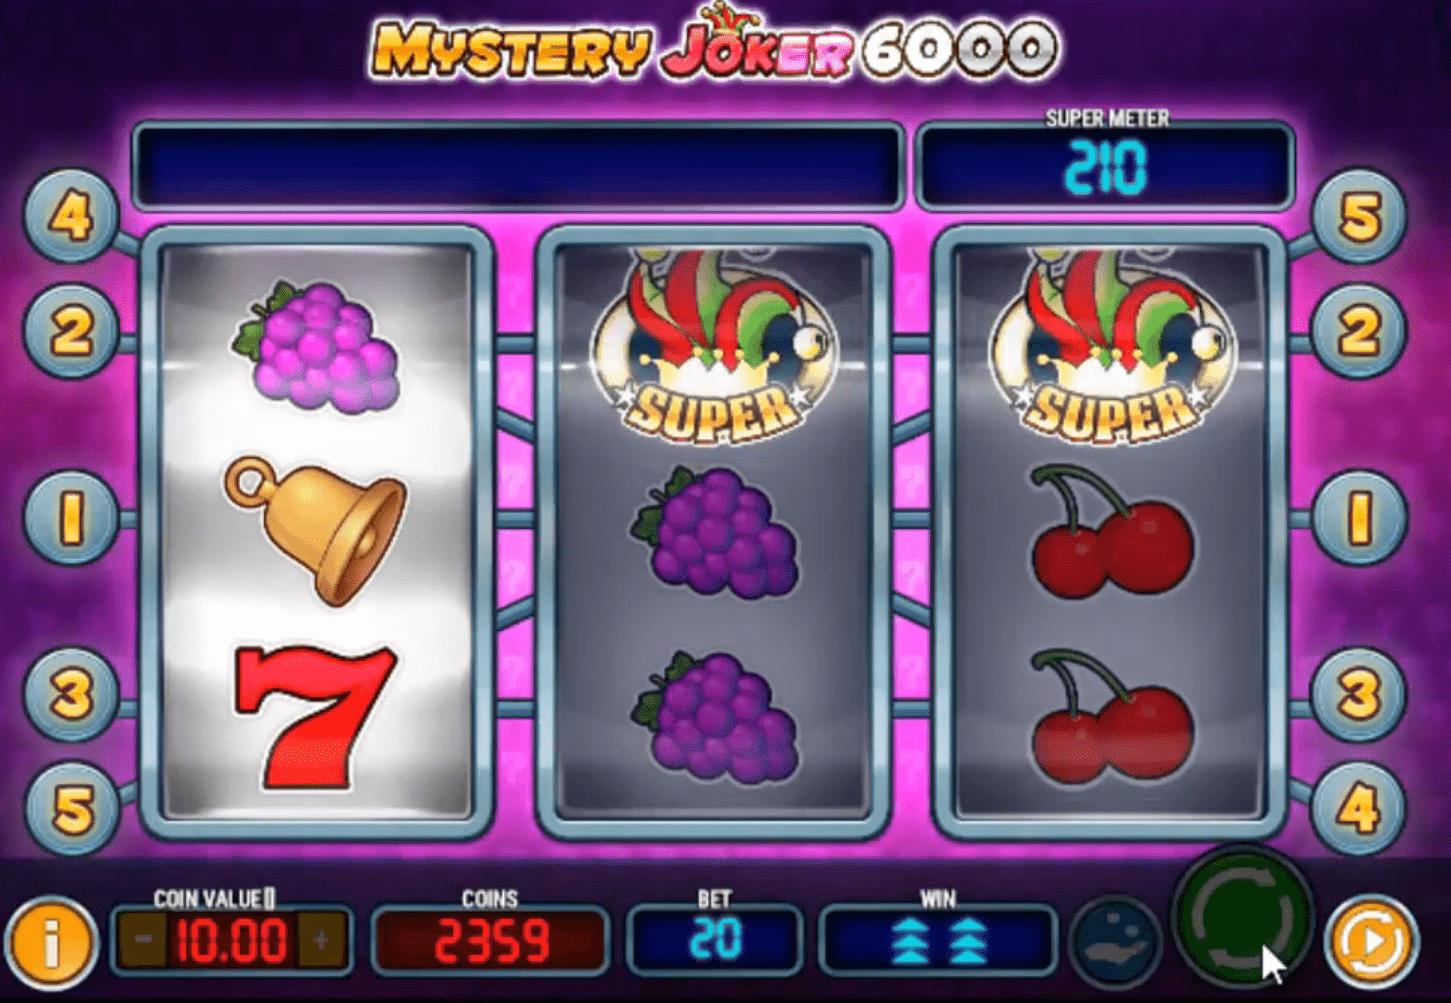 Mystery Joker 6000 Slots Payline